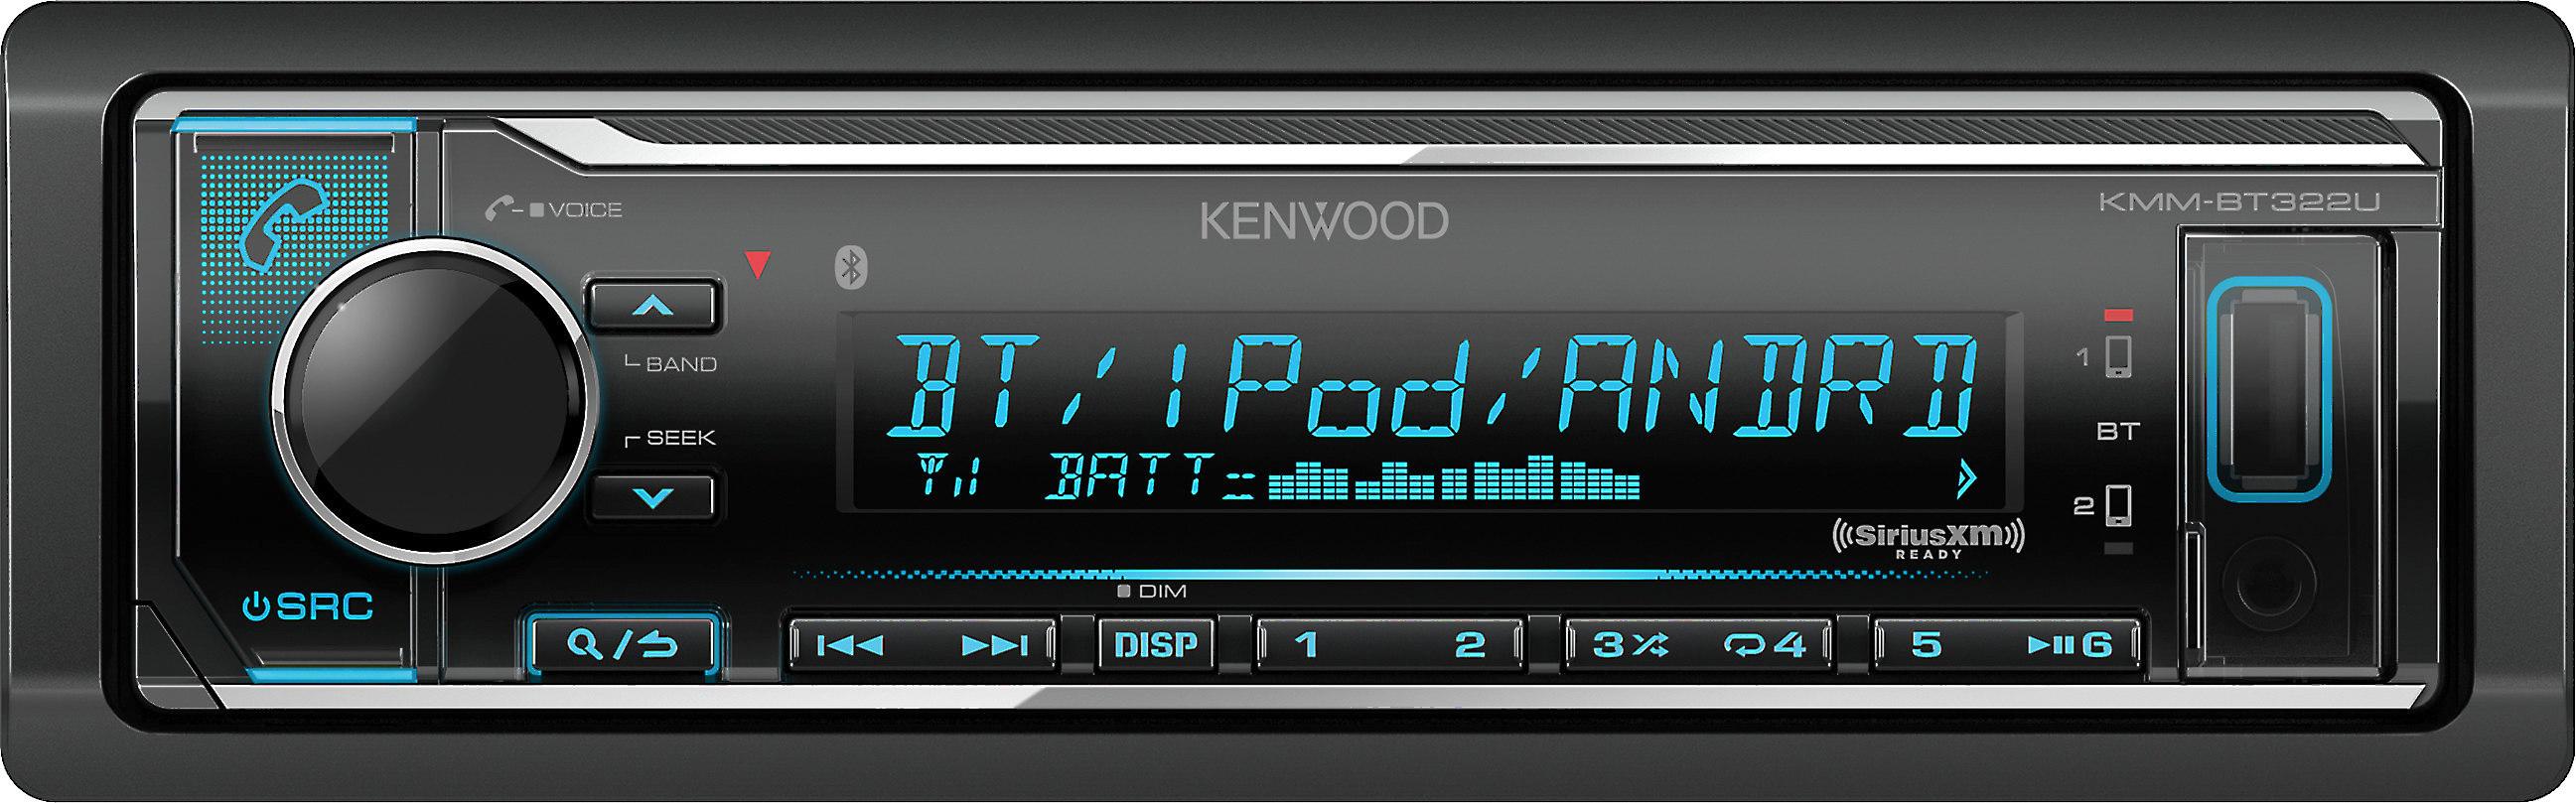 Kenwood Kmm-Bt322U Wiring Diagram from images.crutchfieldonline.com